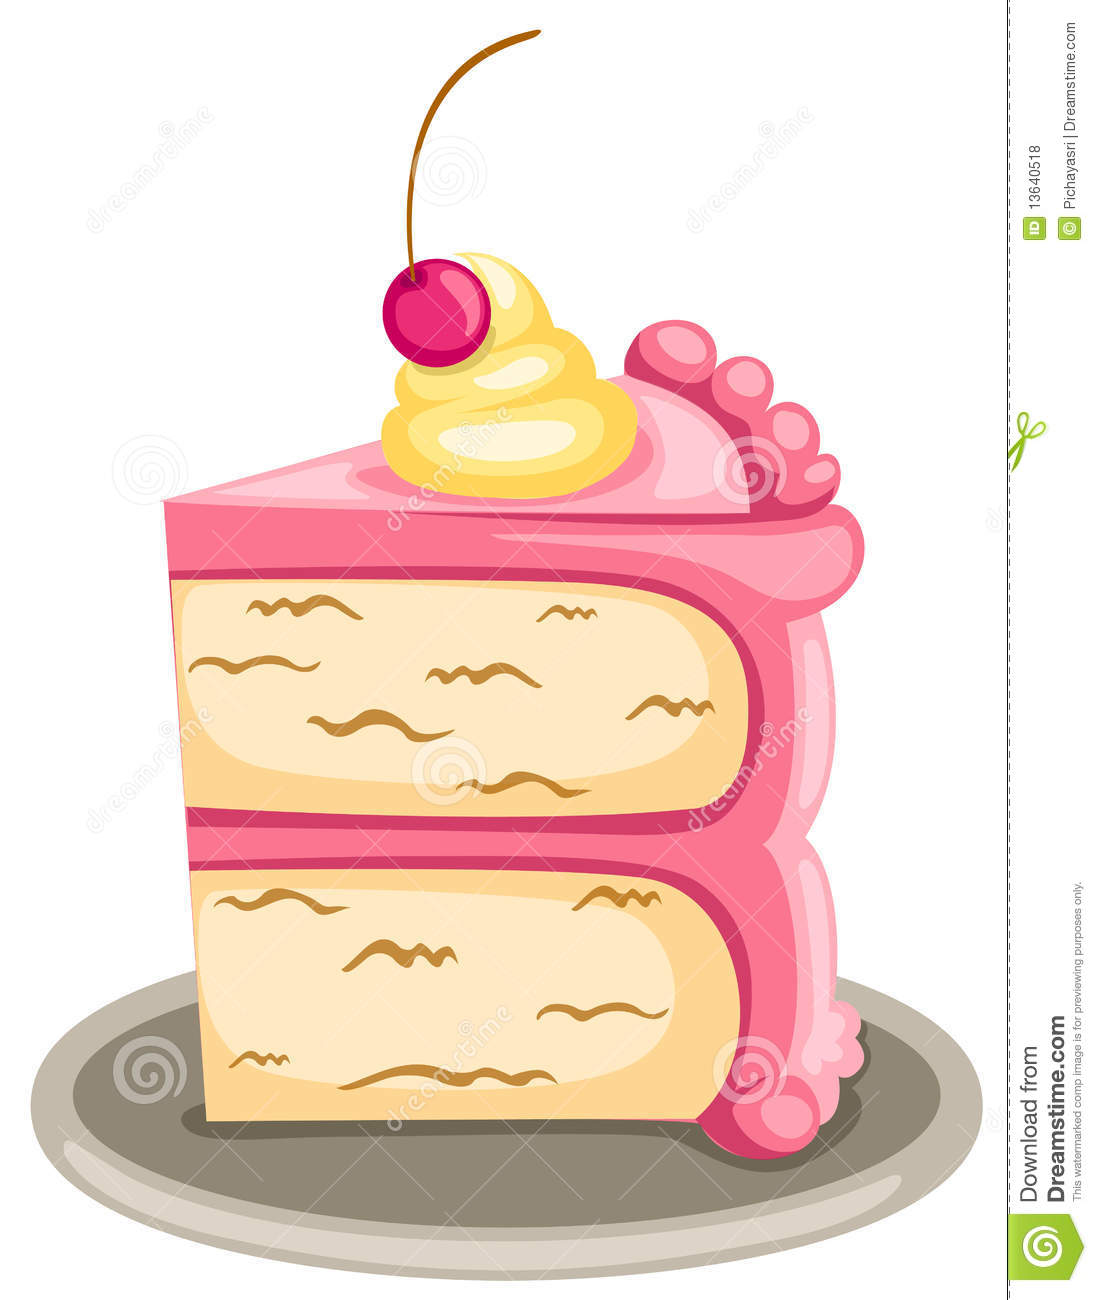 Slice of cake clip art vector Piece Of Cake Clipart - Clipart Kid vector